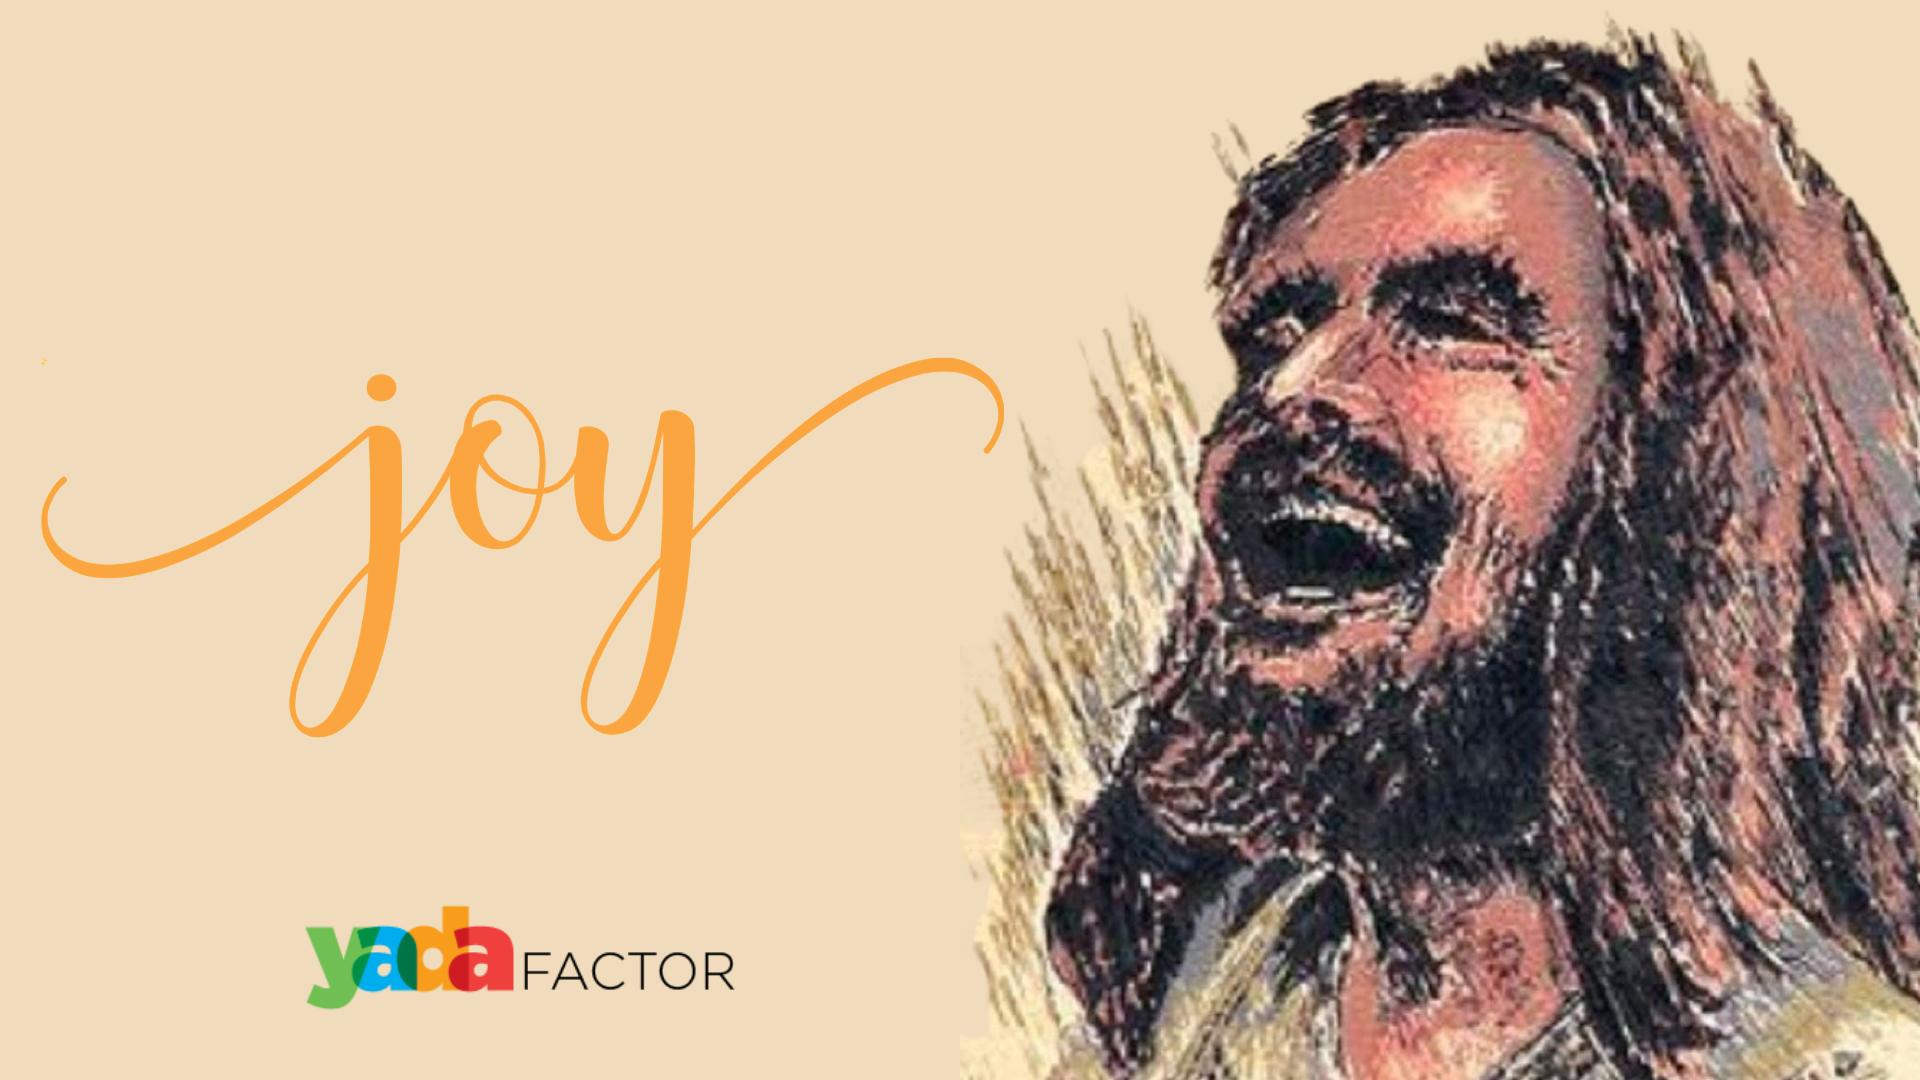 The joy set before Him.